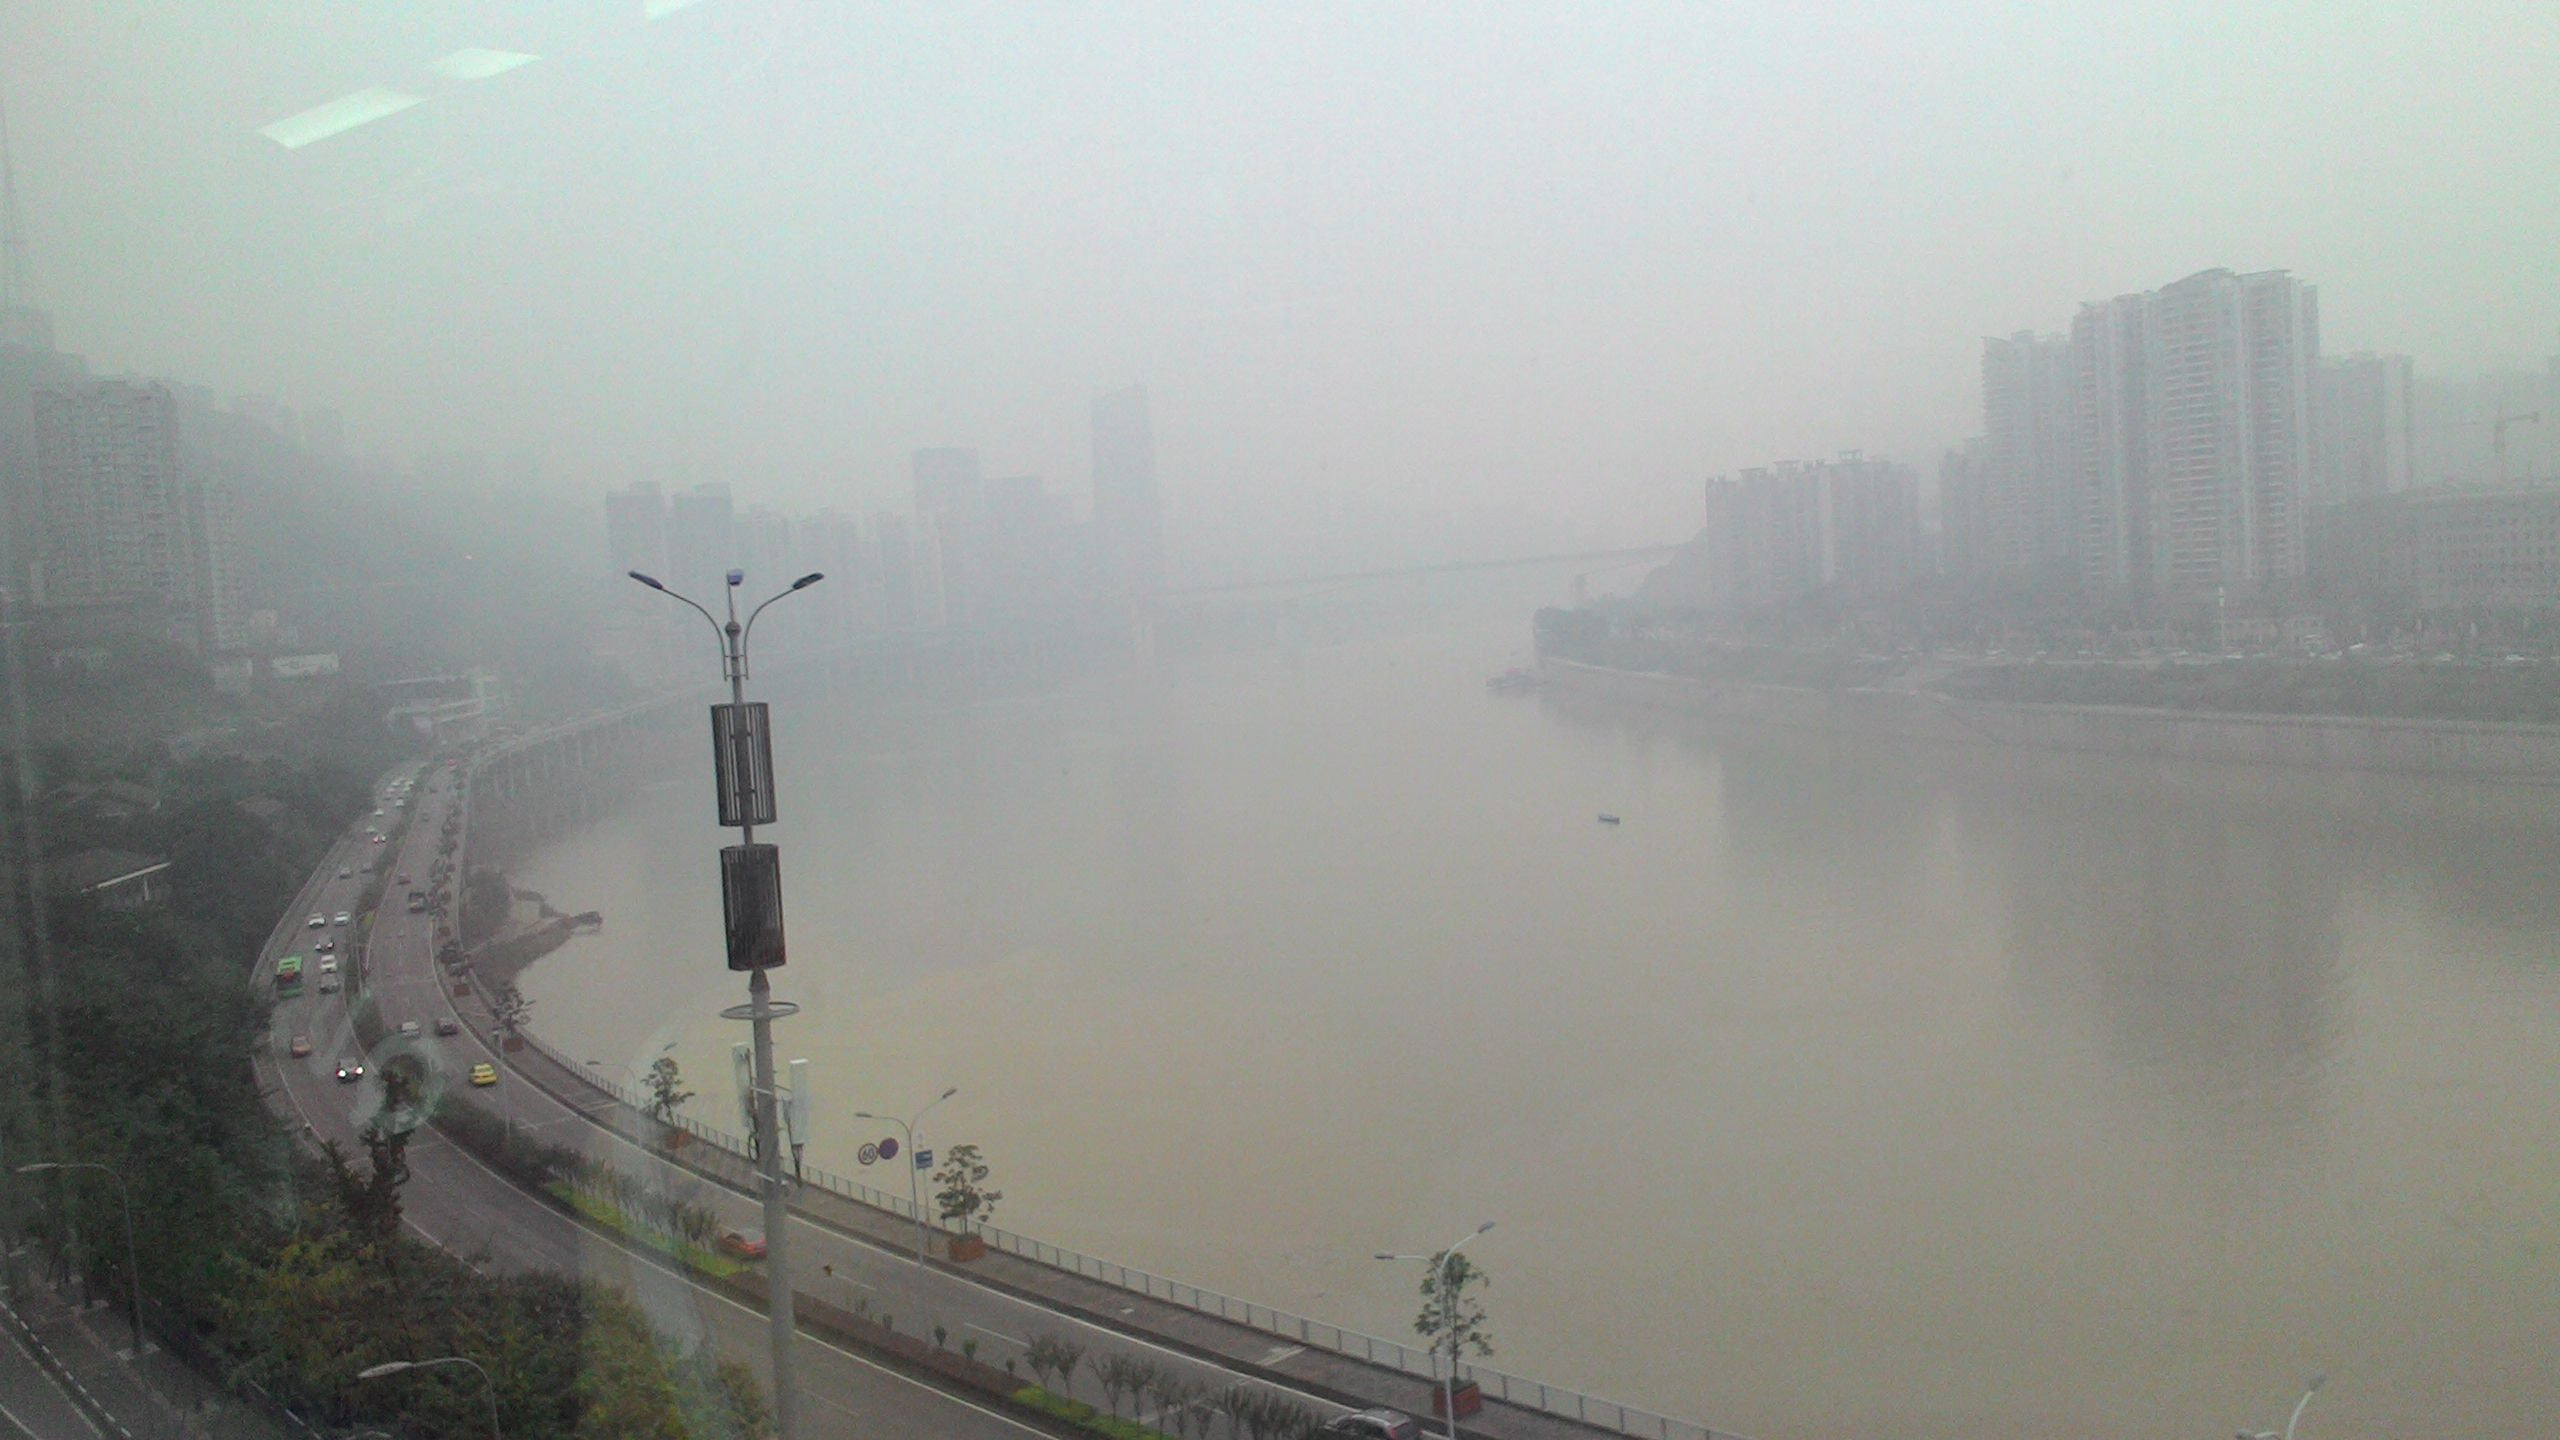 Free stock photo of city, city life, smog